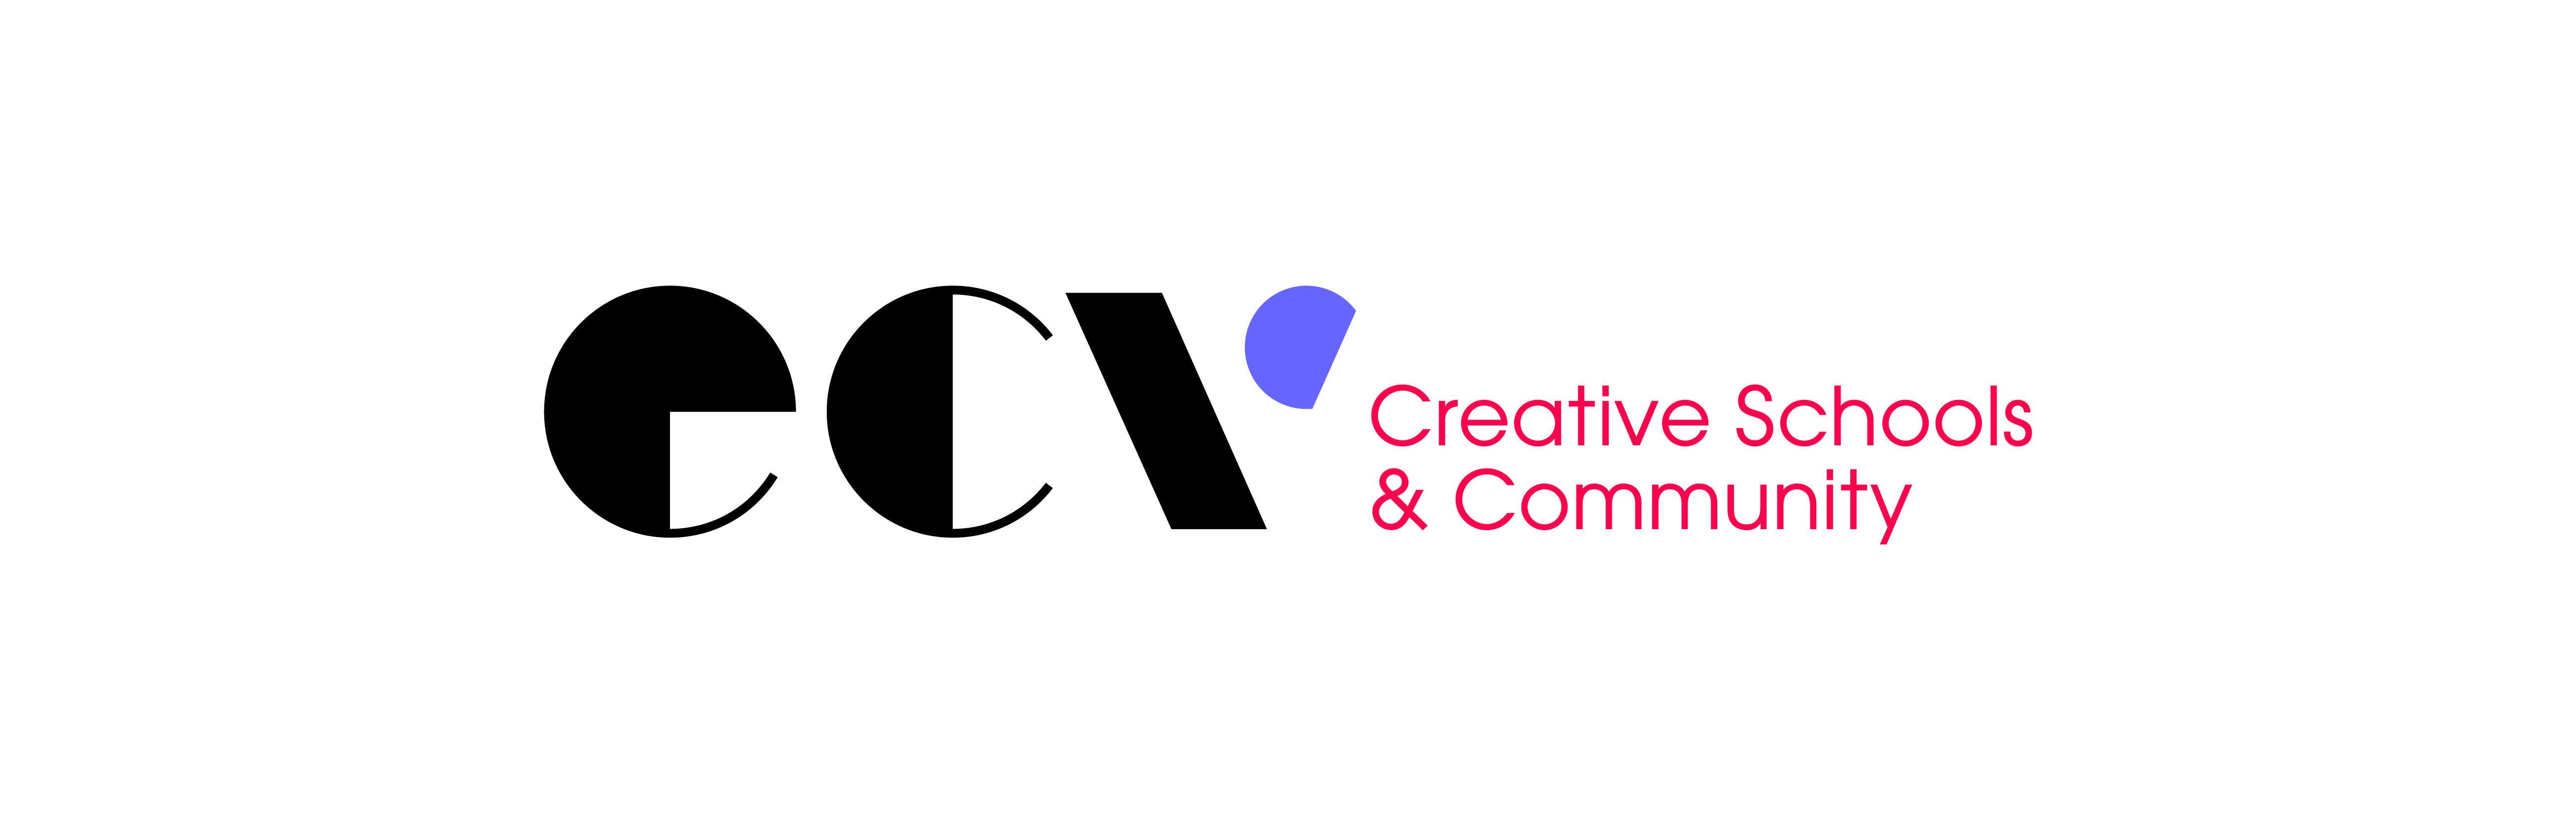 ECV - Prepa Art/ Design/ Animation